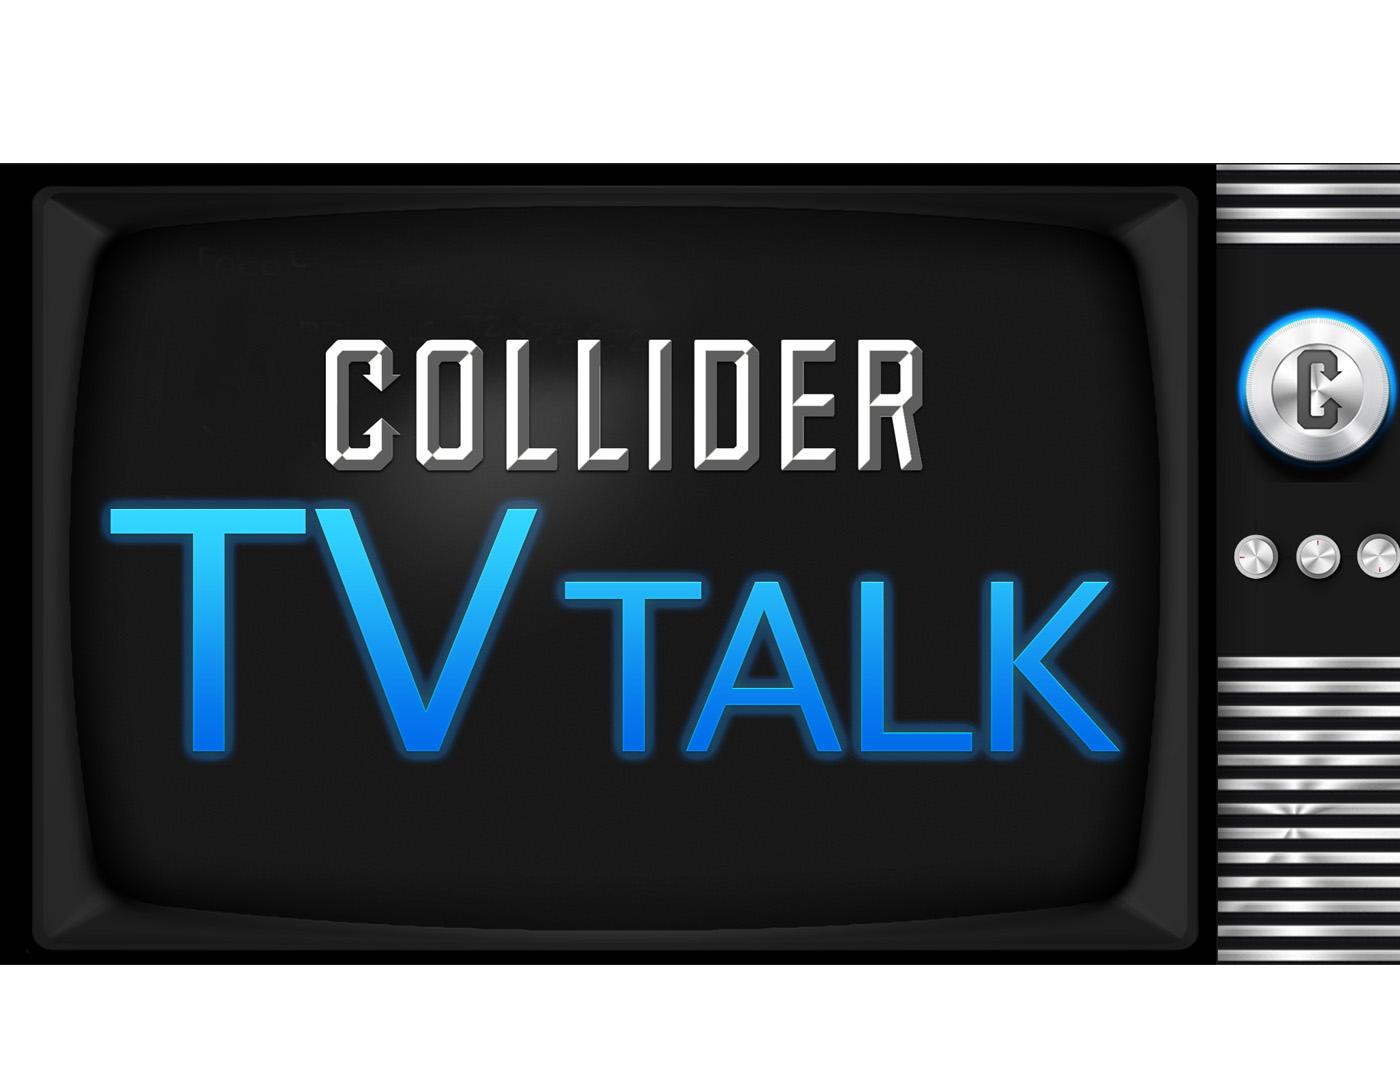 CW's Black Lightning Cast and Plot Details, Cloak and Dagger Casting - Collider TV Talk